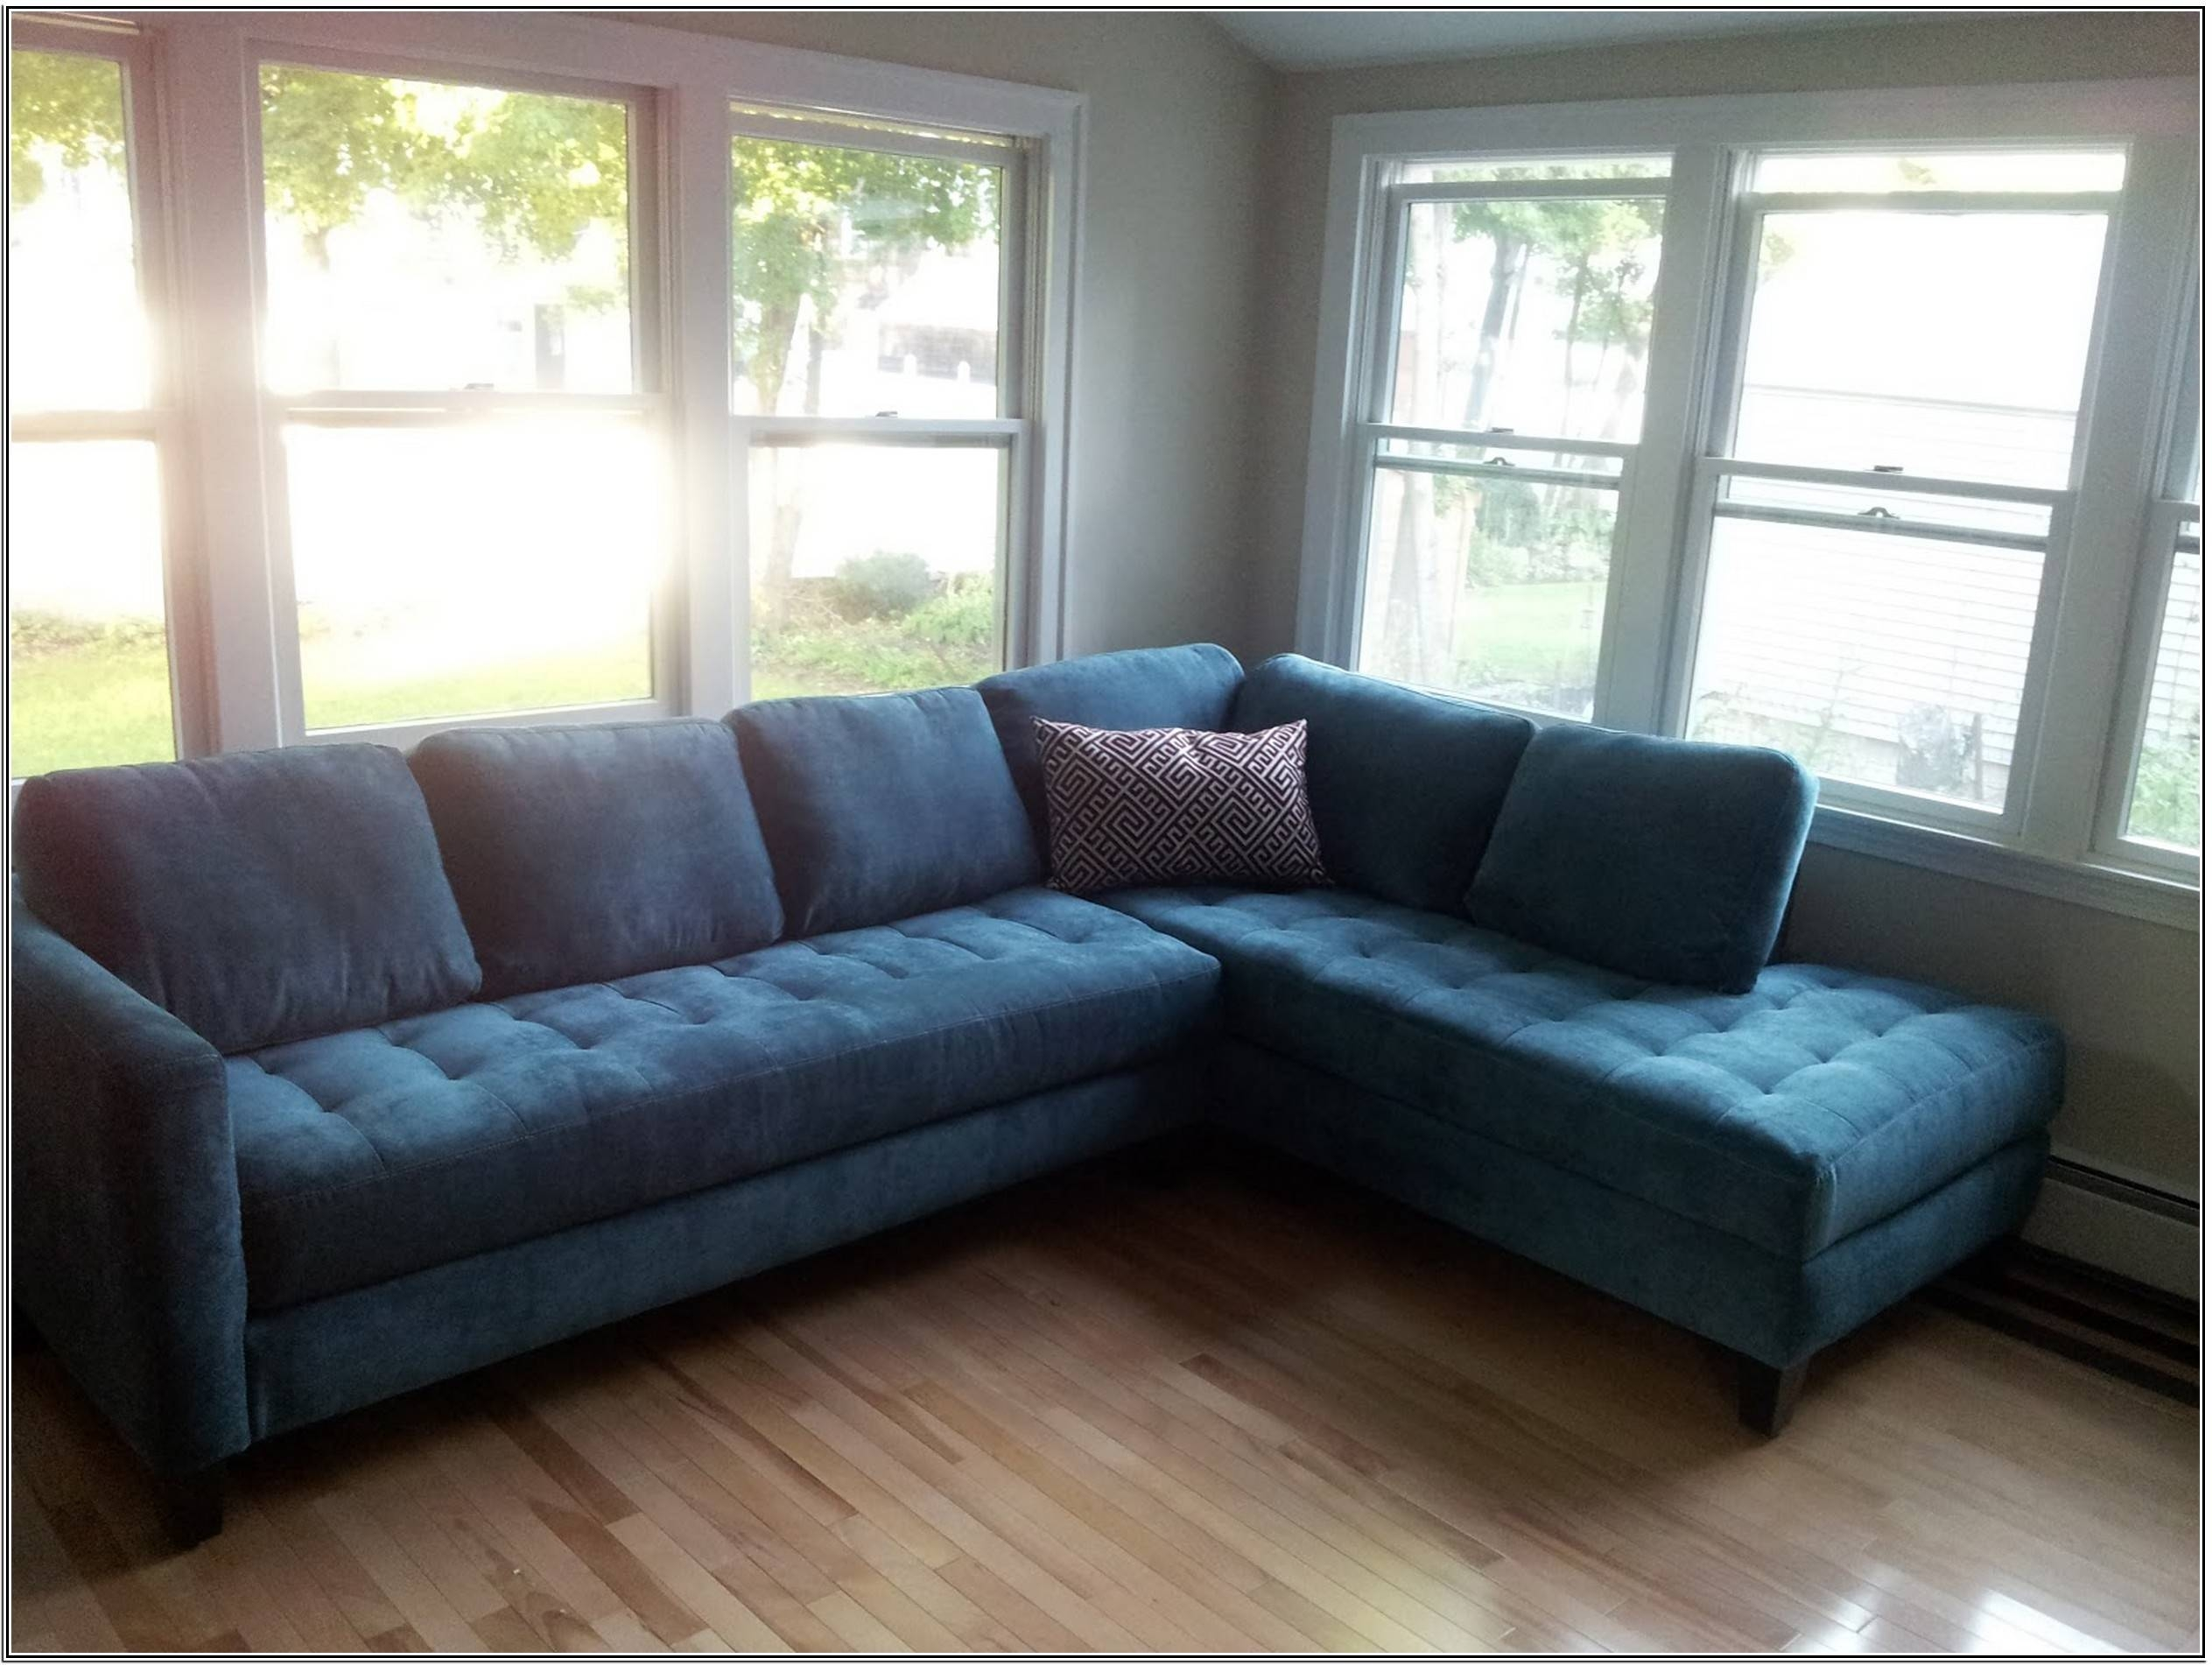 Sofas: Macys Sectional Sofa | Macys Leather Sofas Sectionals regarding Soft Sectional Sofas (Image 26 of 30)